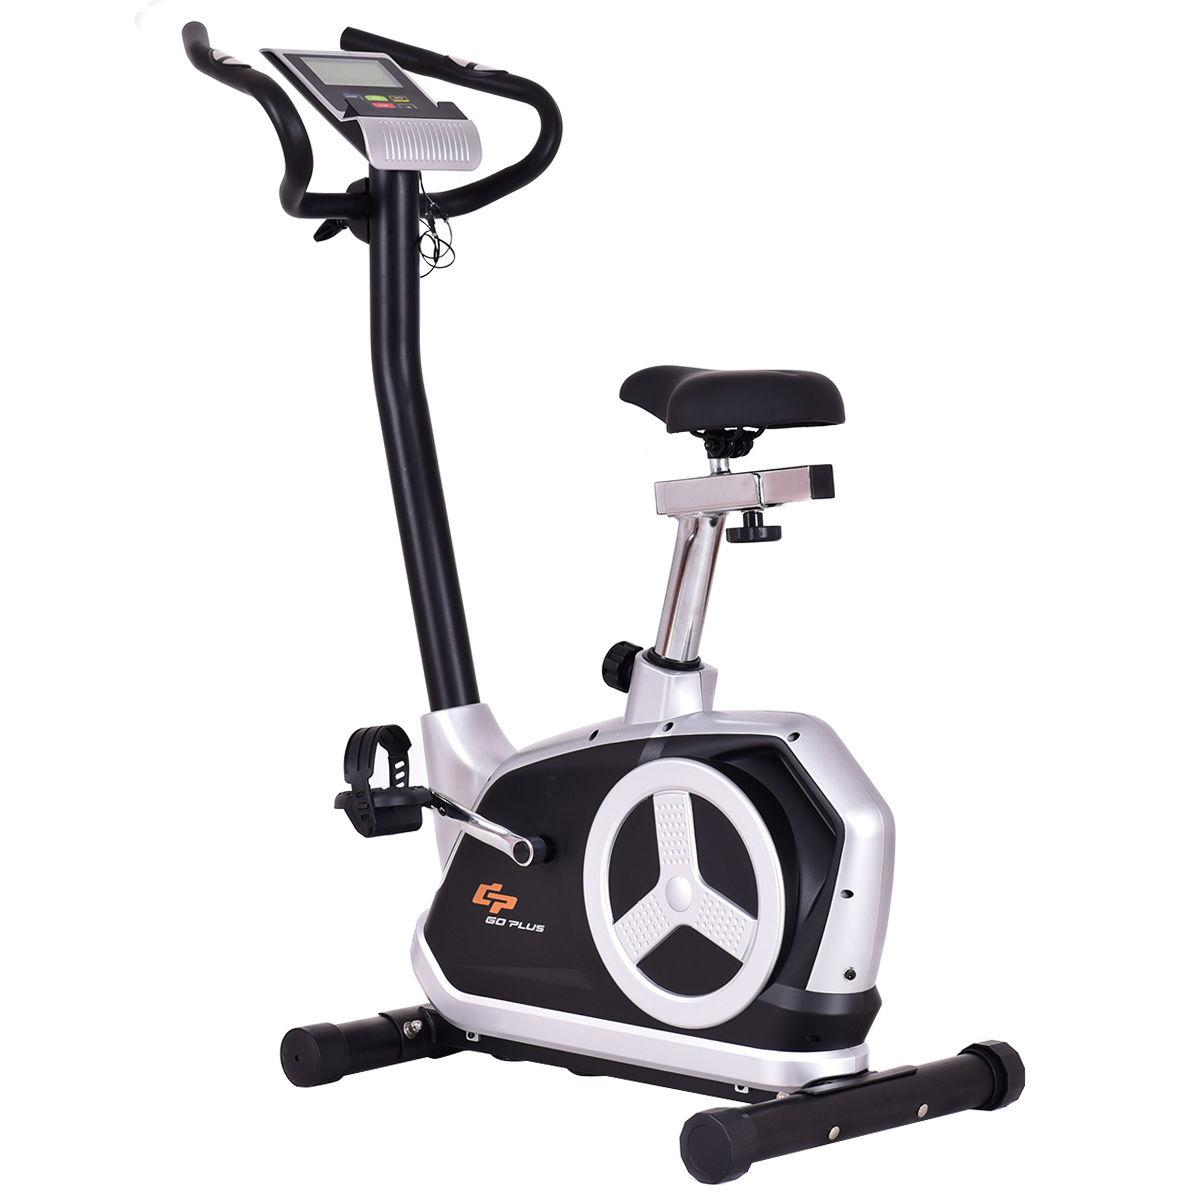 Goplus Magnetic Resistance Upright Bike Flywheel Cardio Fitness w/ Phone Holder